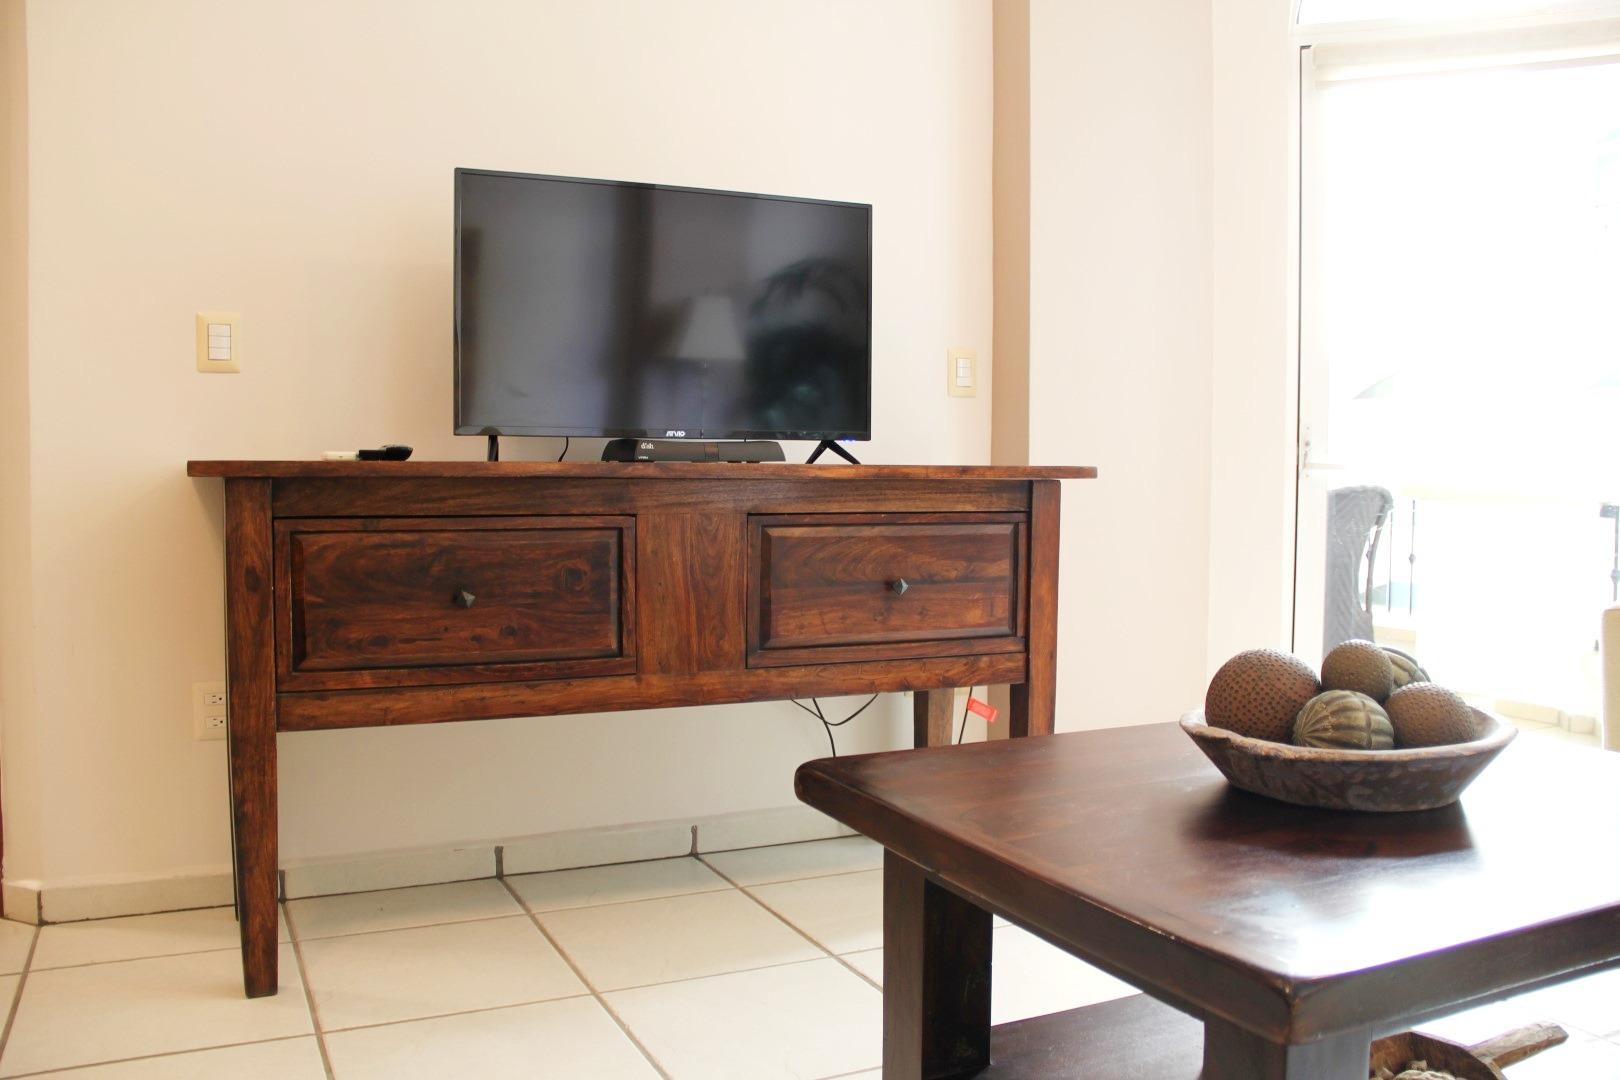 TV in living room.